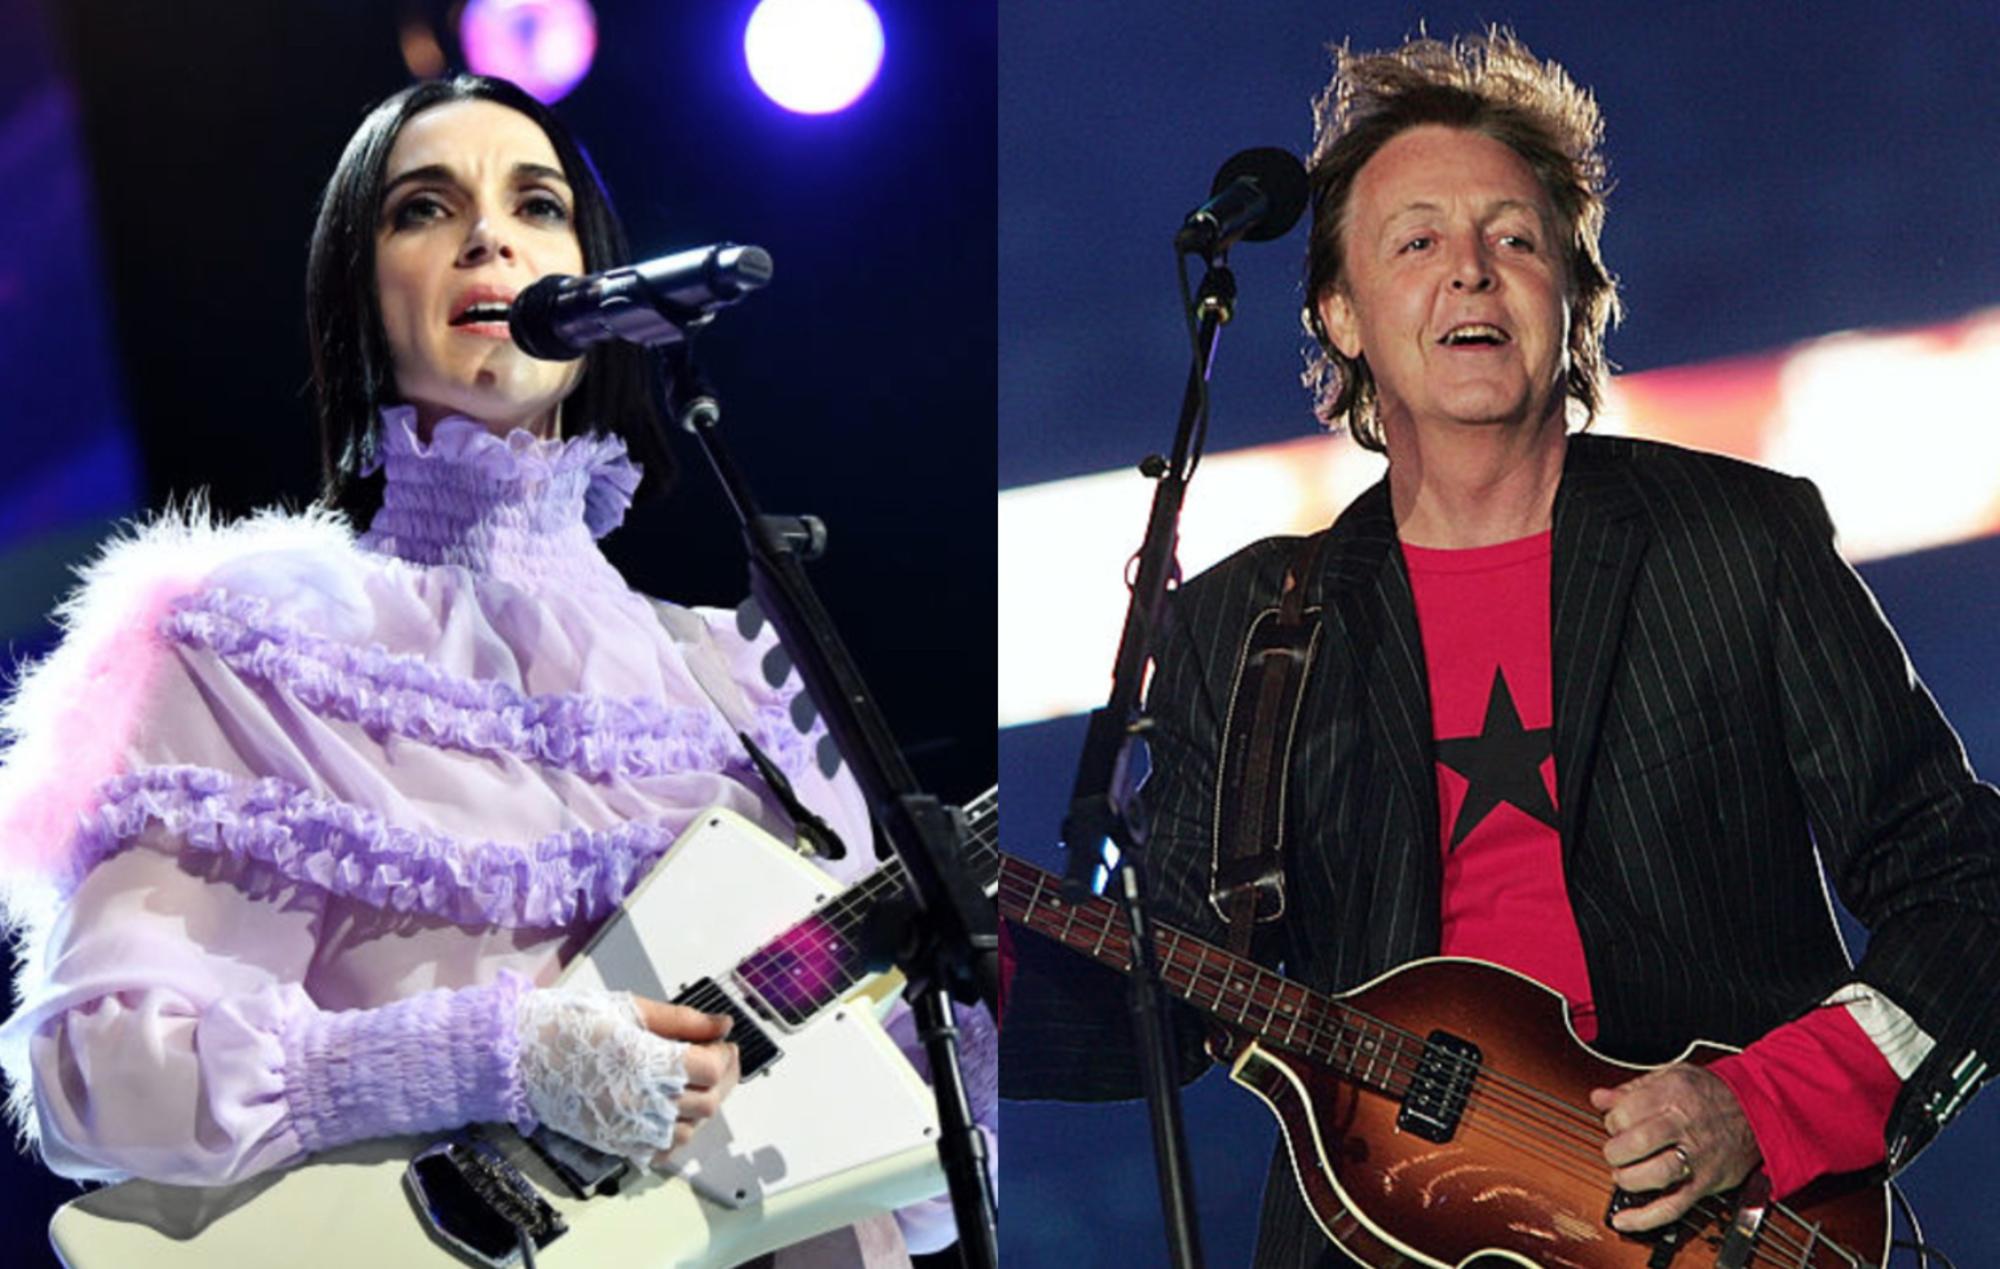 St. Vincent and Paul McCartney